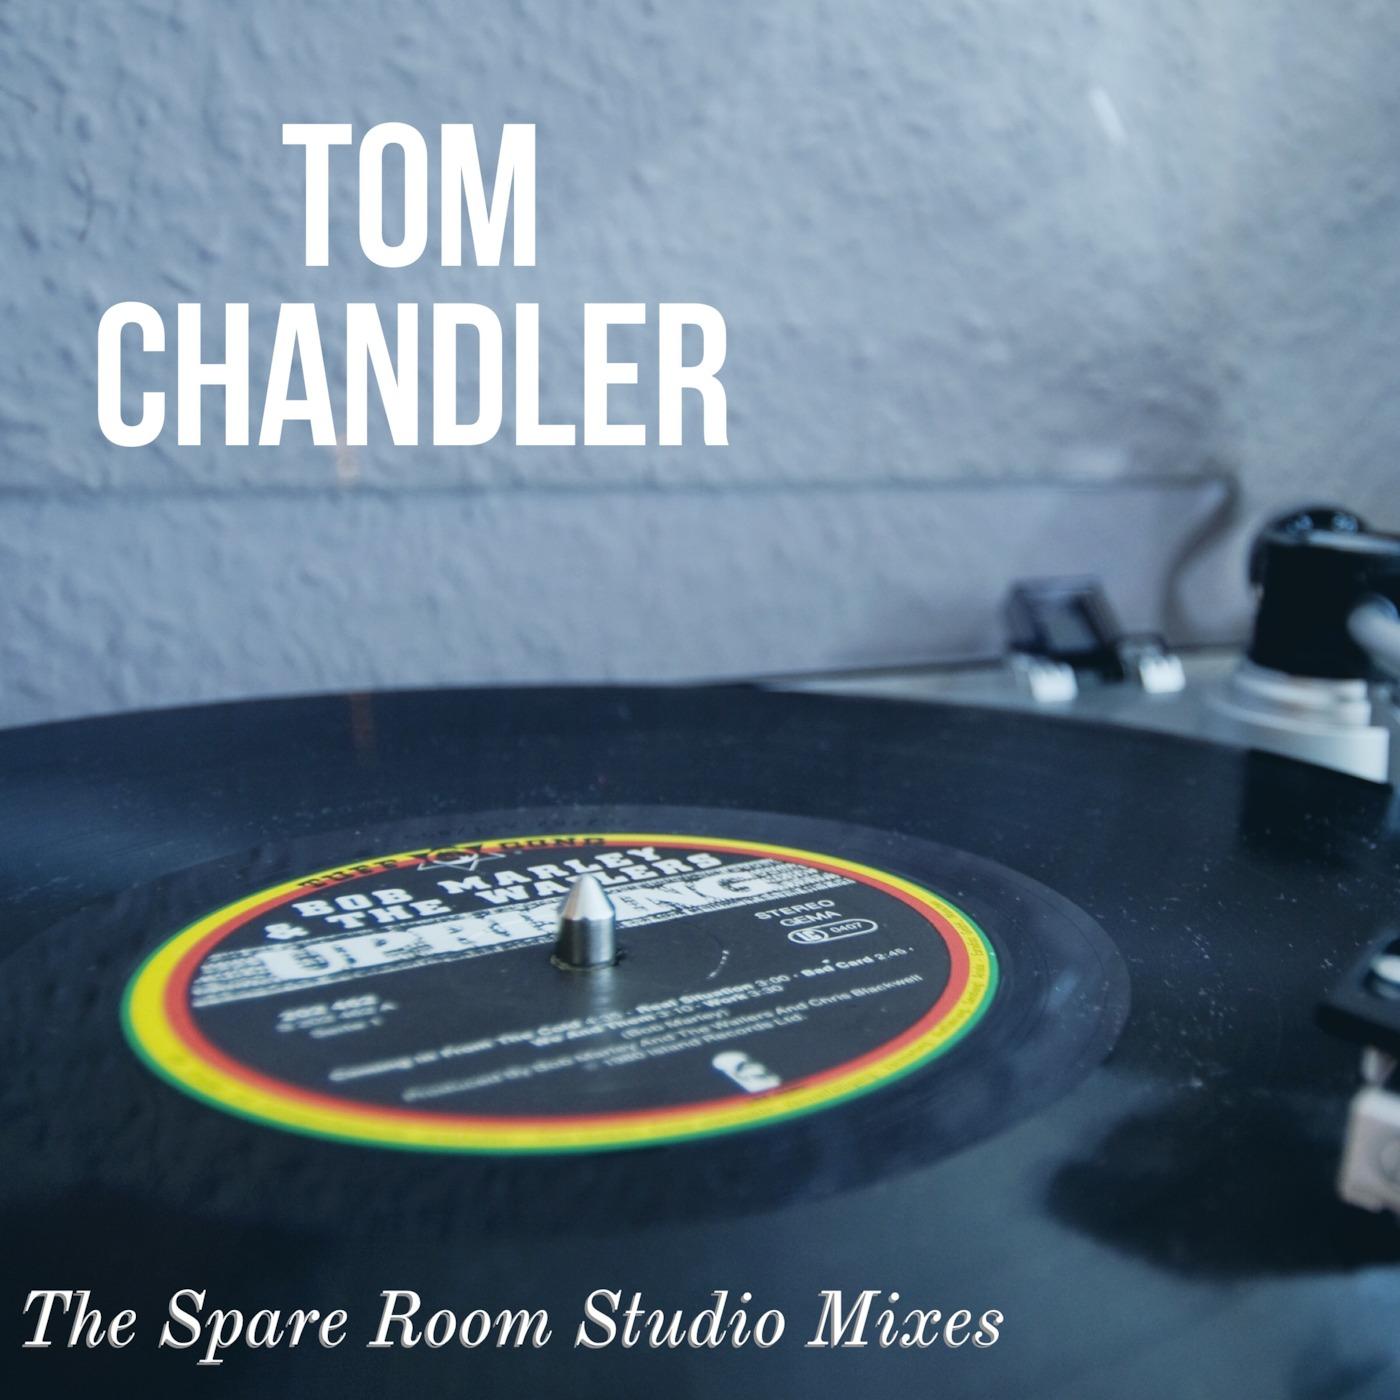 The Spare Room Studio Mixes